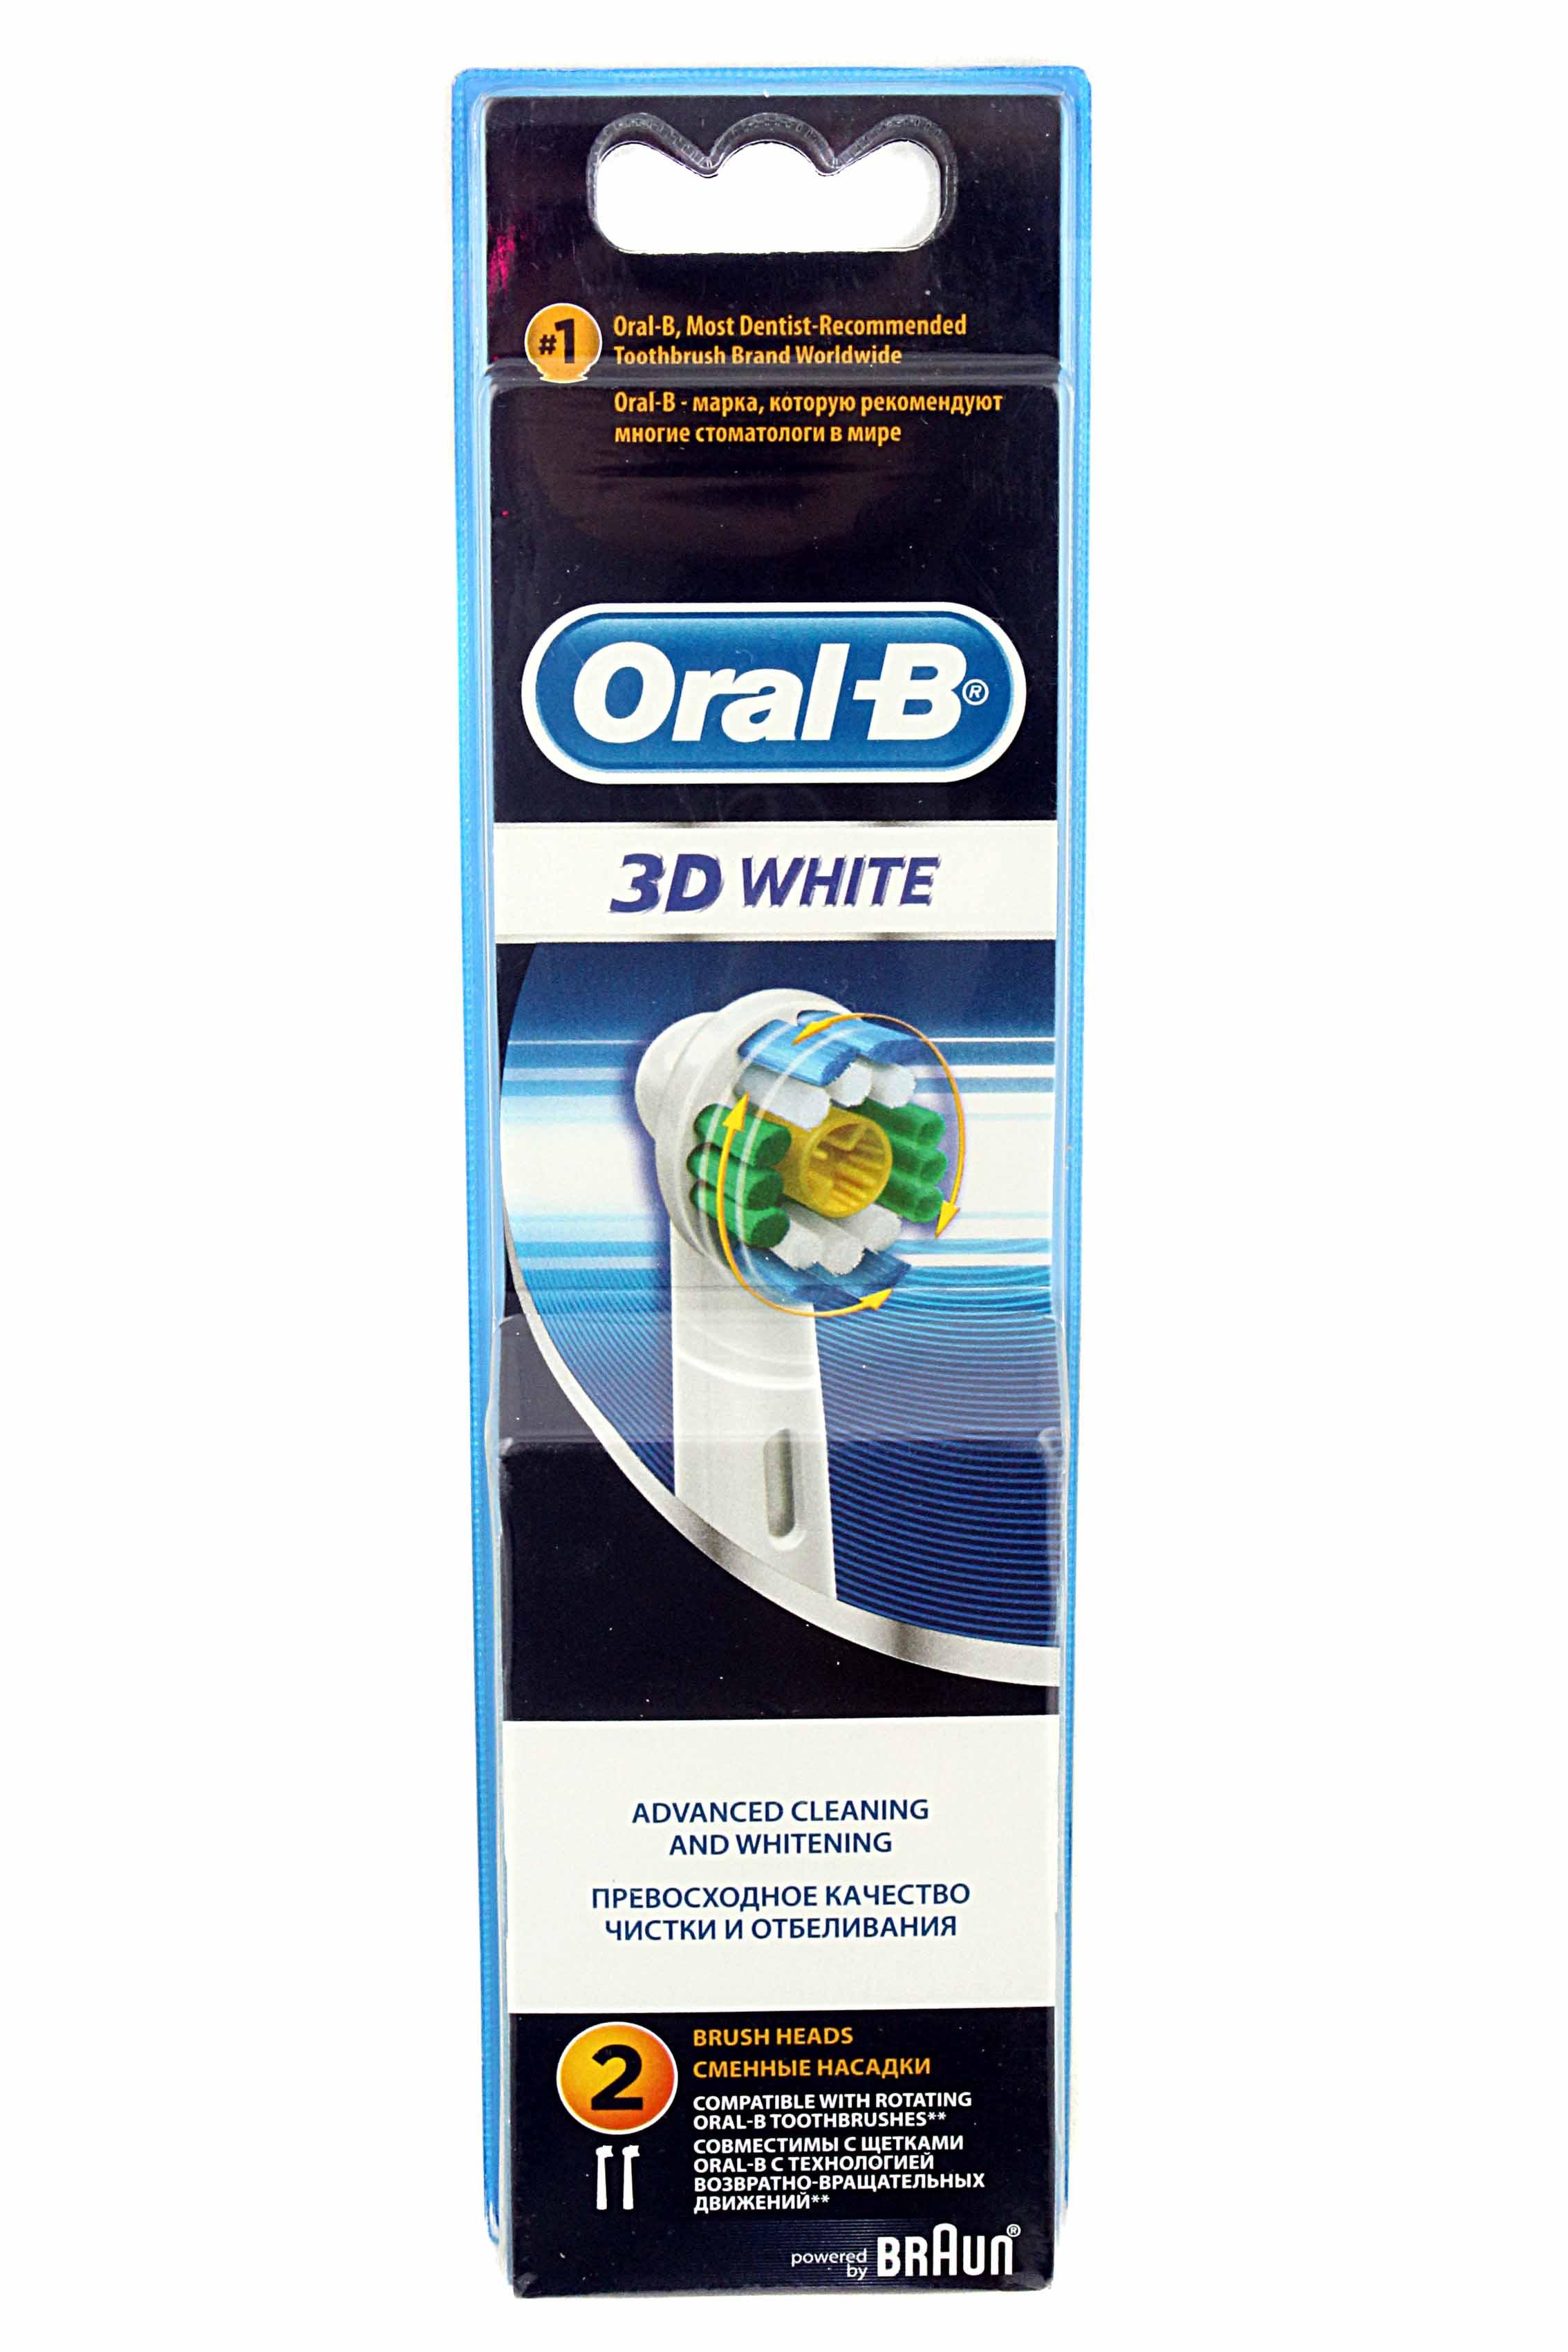 Насадки для эл. зубных щеток Braun Real Brand Technics 541.000